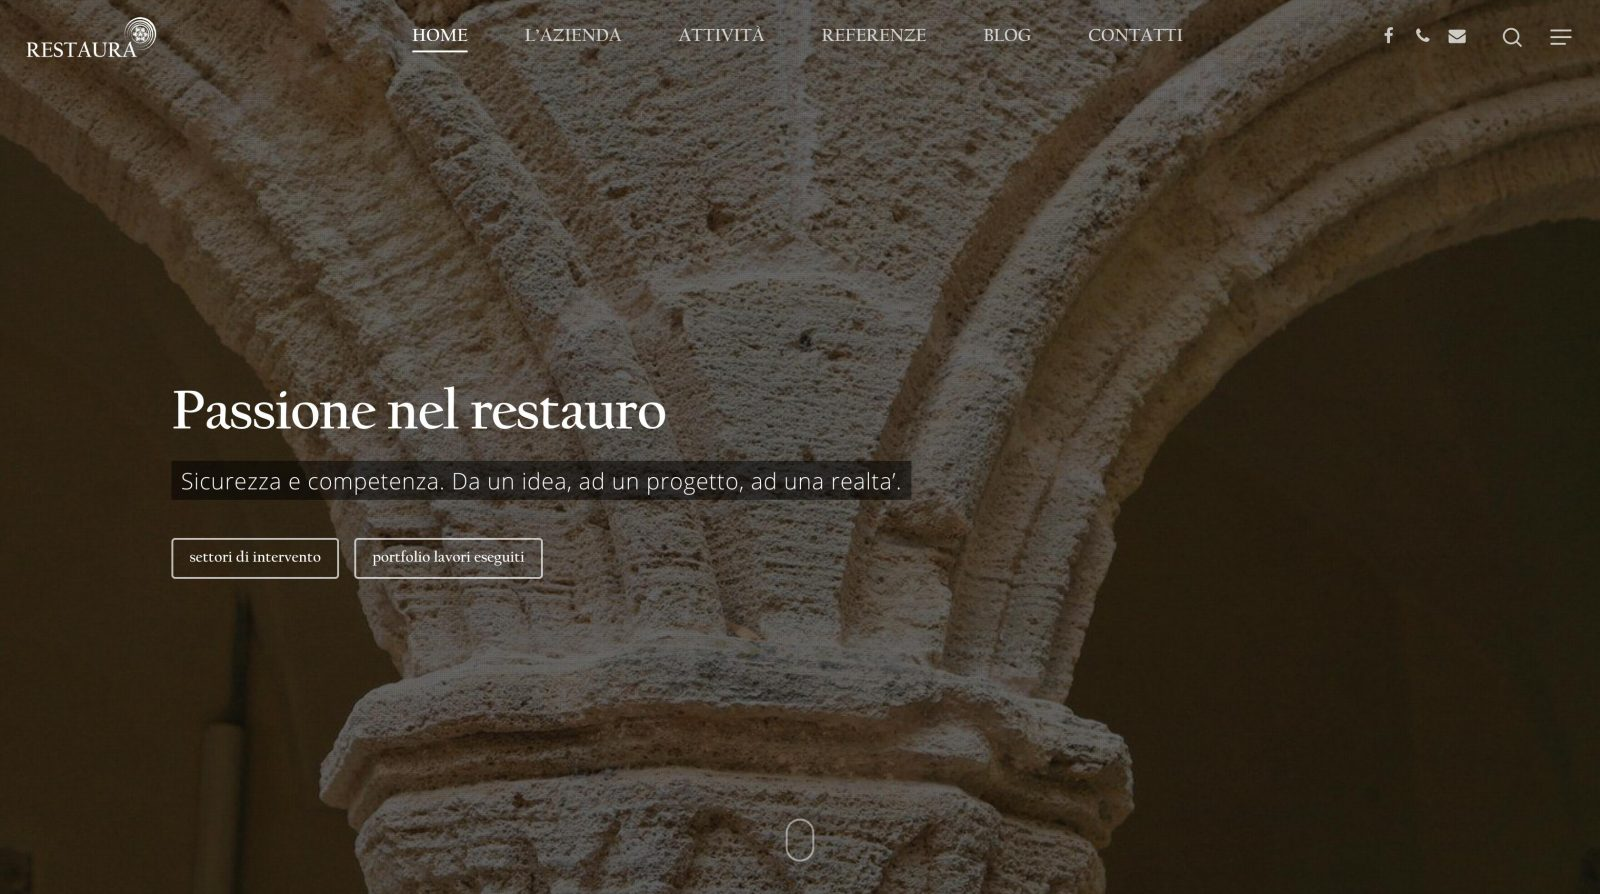 sito web • impresa Restaura